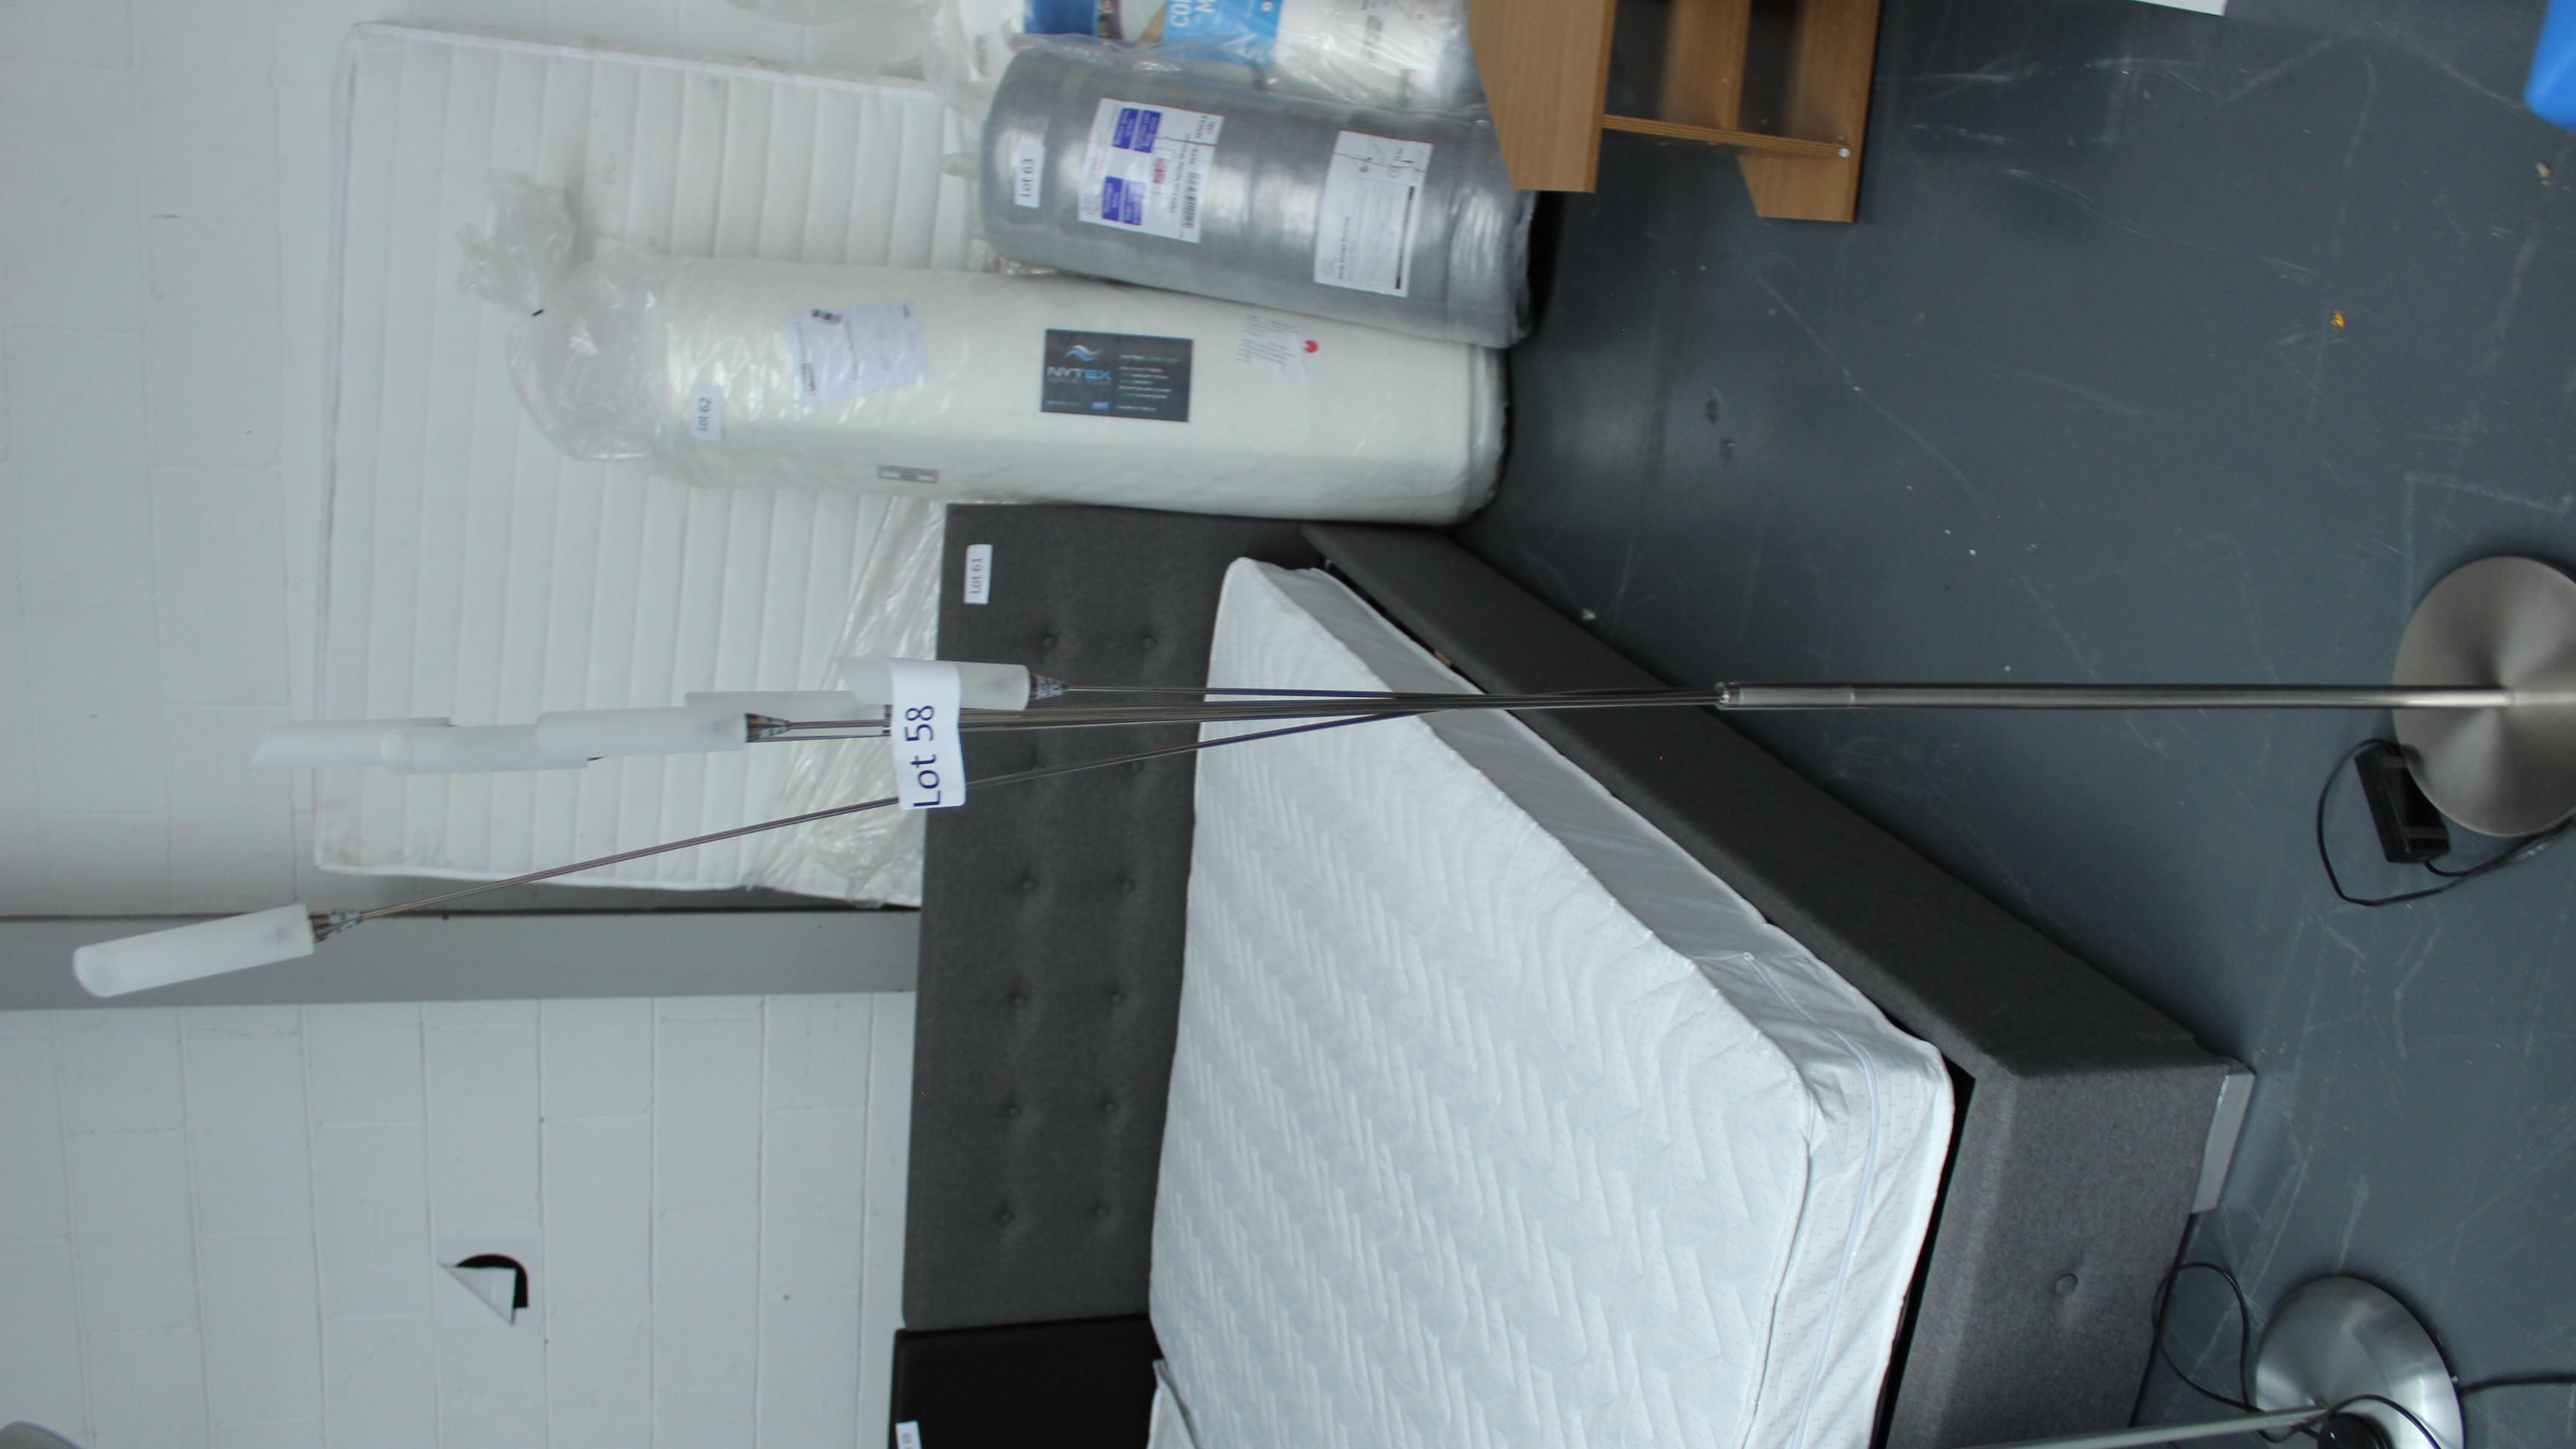 Lot 58 - Floor Lamp with Glass Shades. Customer Returns